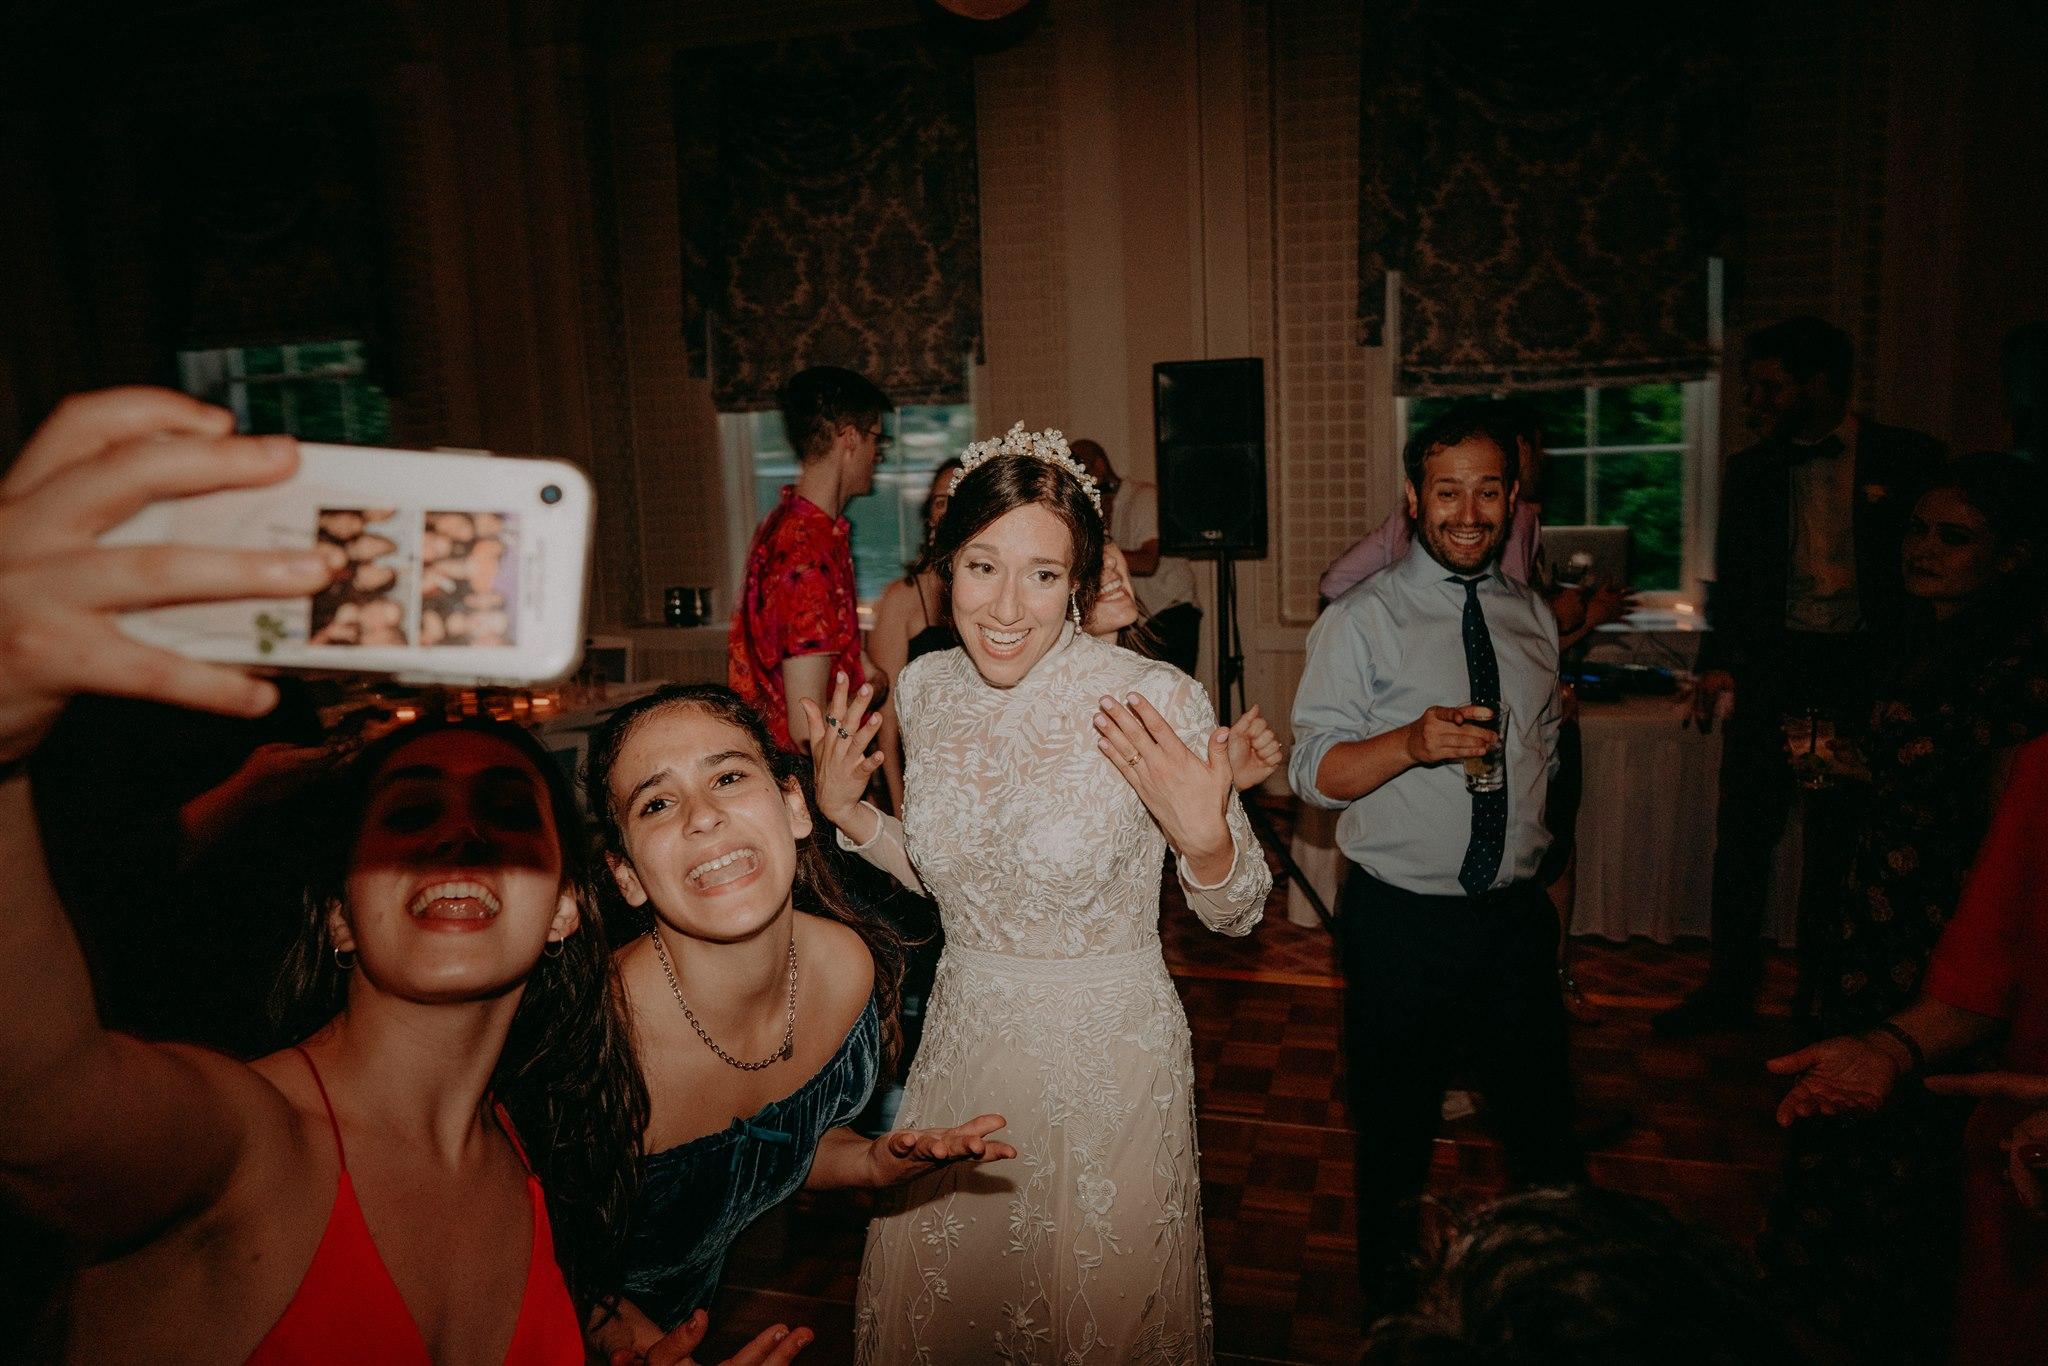 Chellise_Michael_Photography_Hudson_Valley_Wedding_Photographer_Otesaga_Hotel-6133.jpg